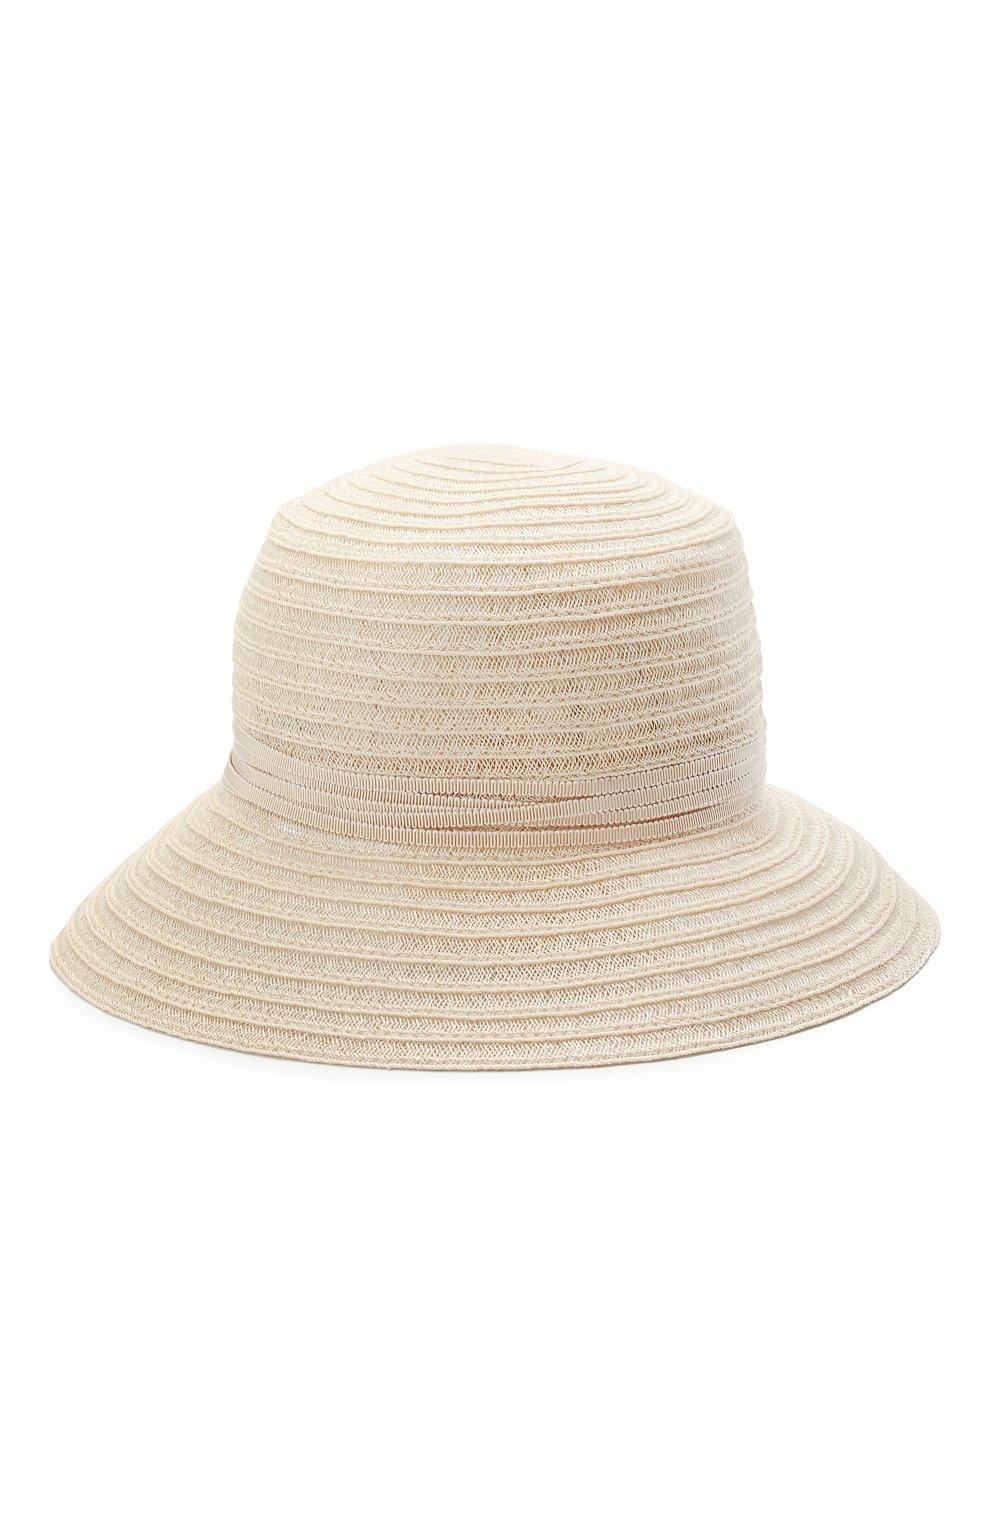 Женская шляпа INVERNI бежевого цвета, арт. 5197 CC | Фото 2